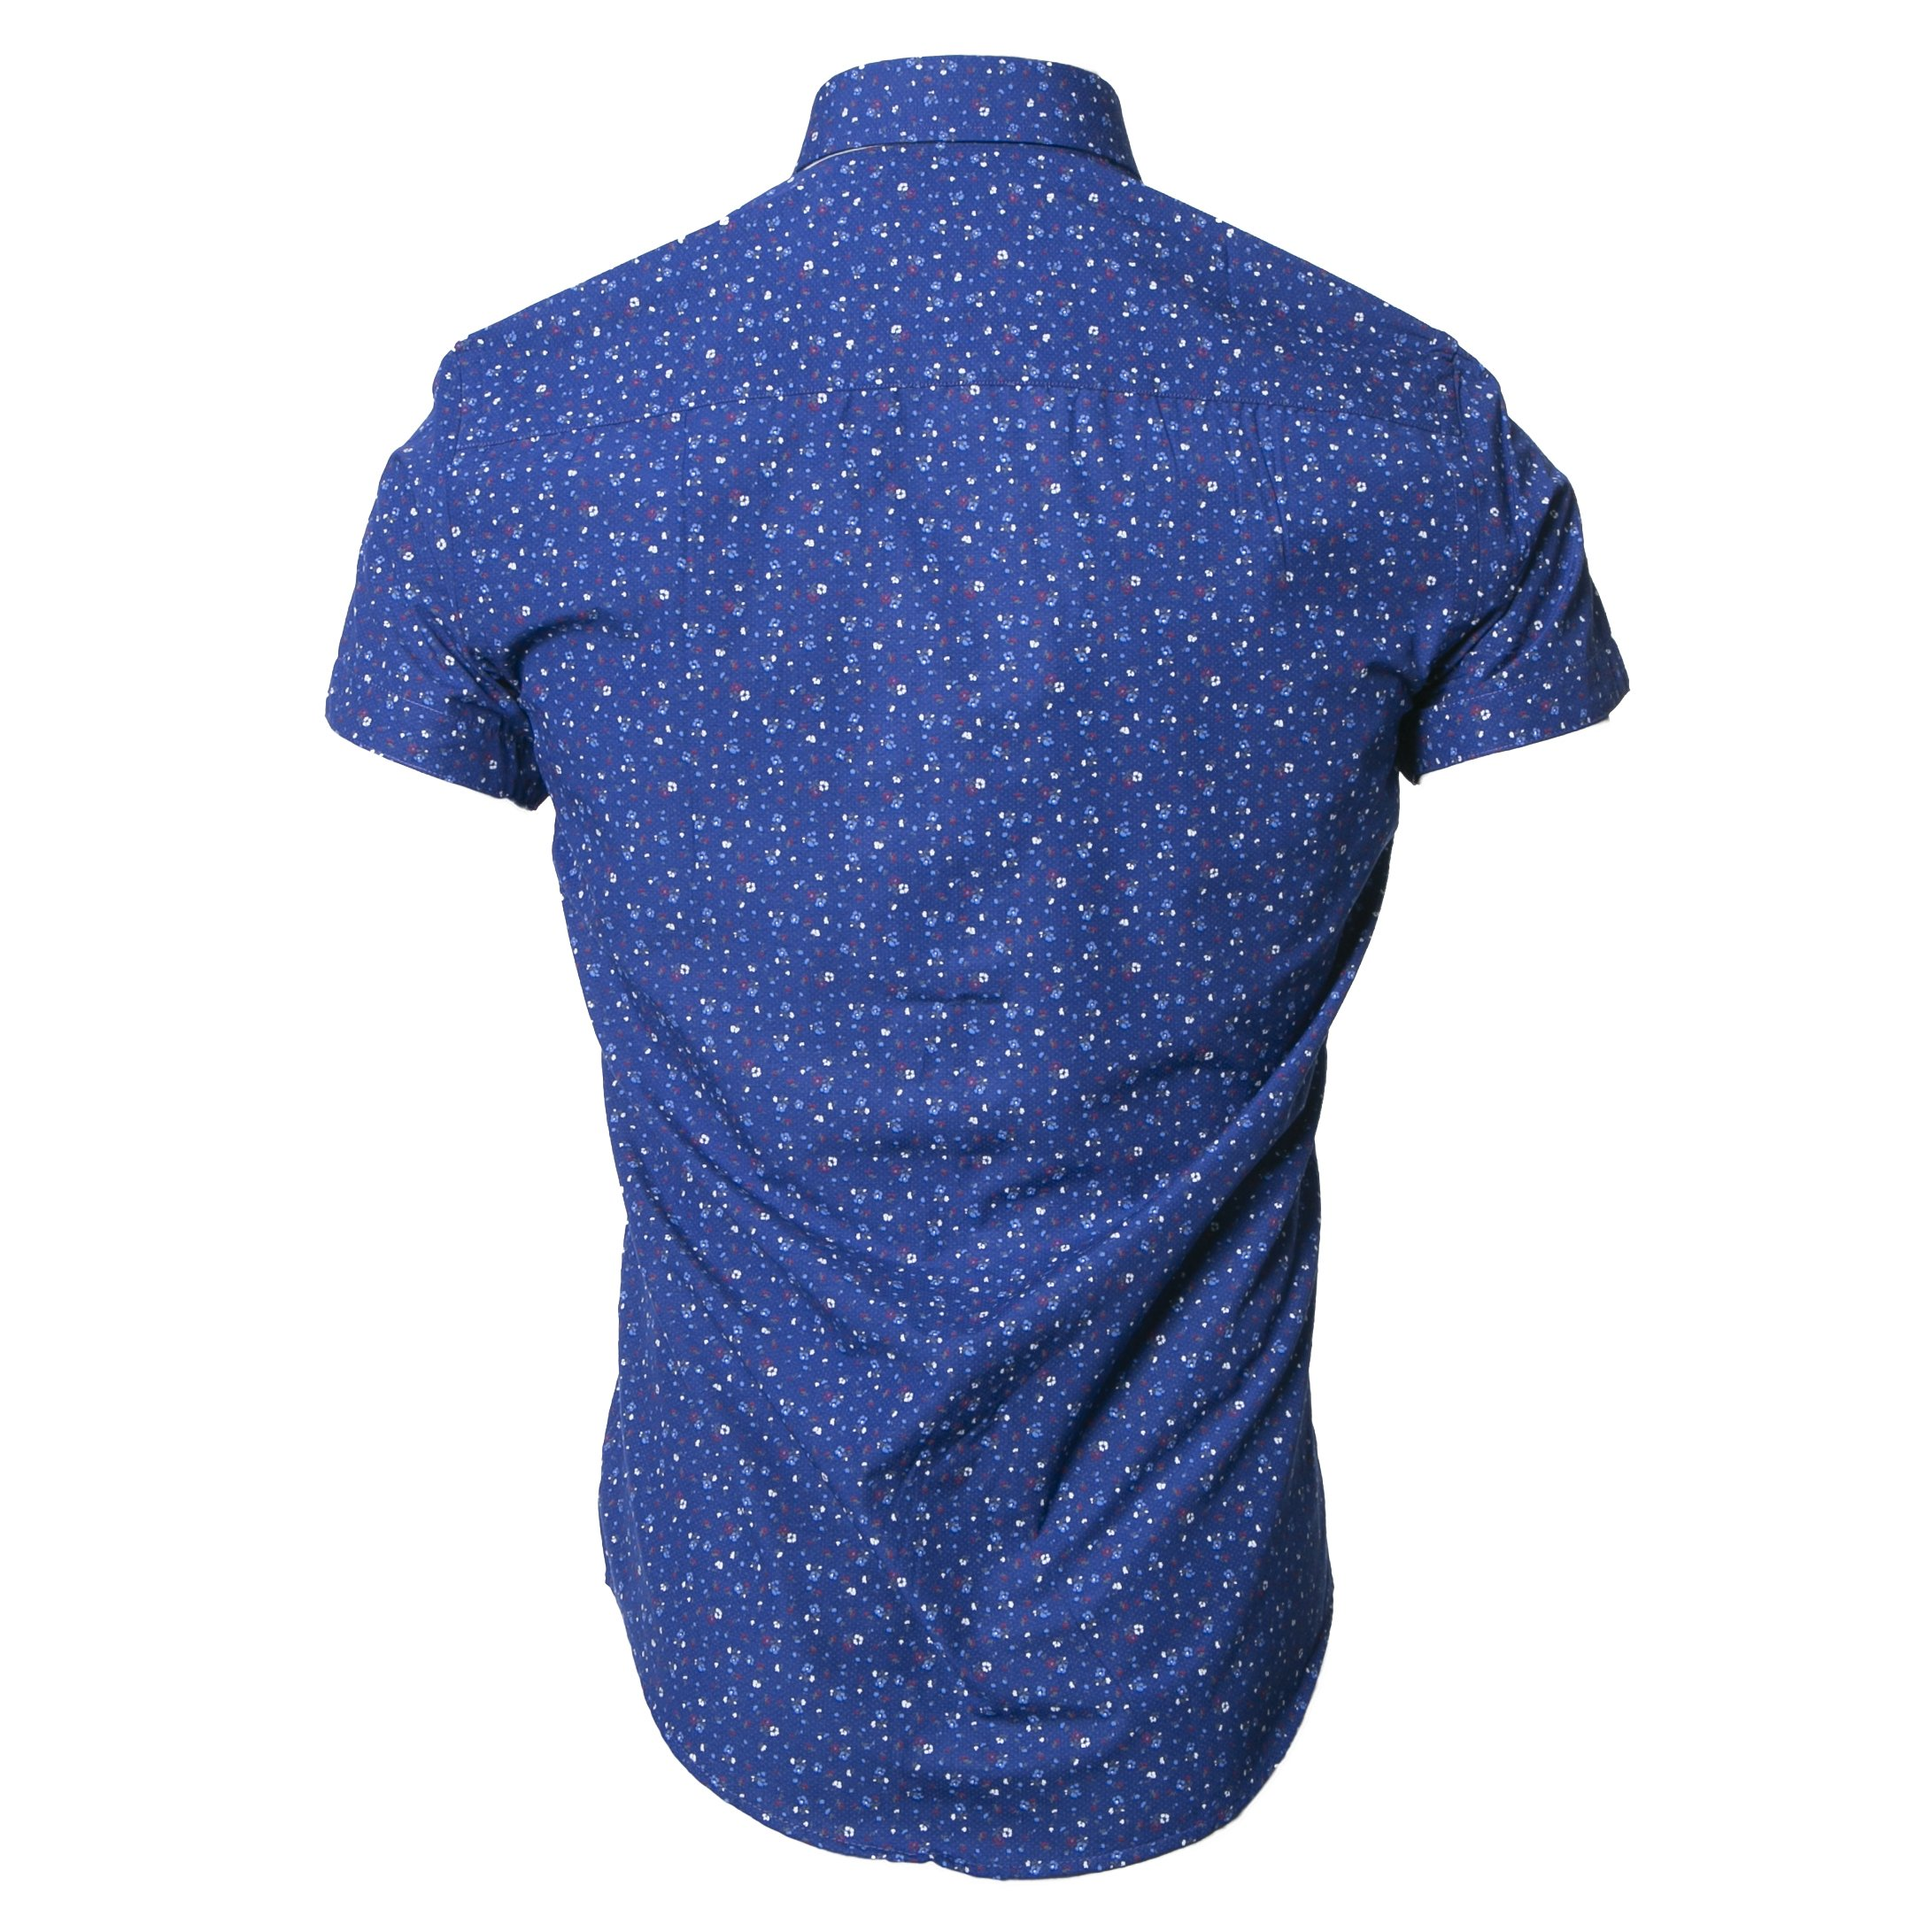 PEDRO ROYAL BLUE FLORAL PRINT SHORT SLEEVE SHIRT